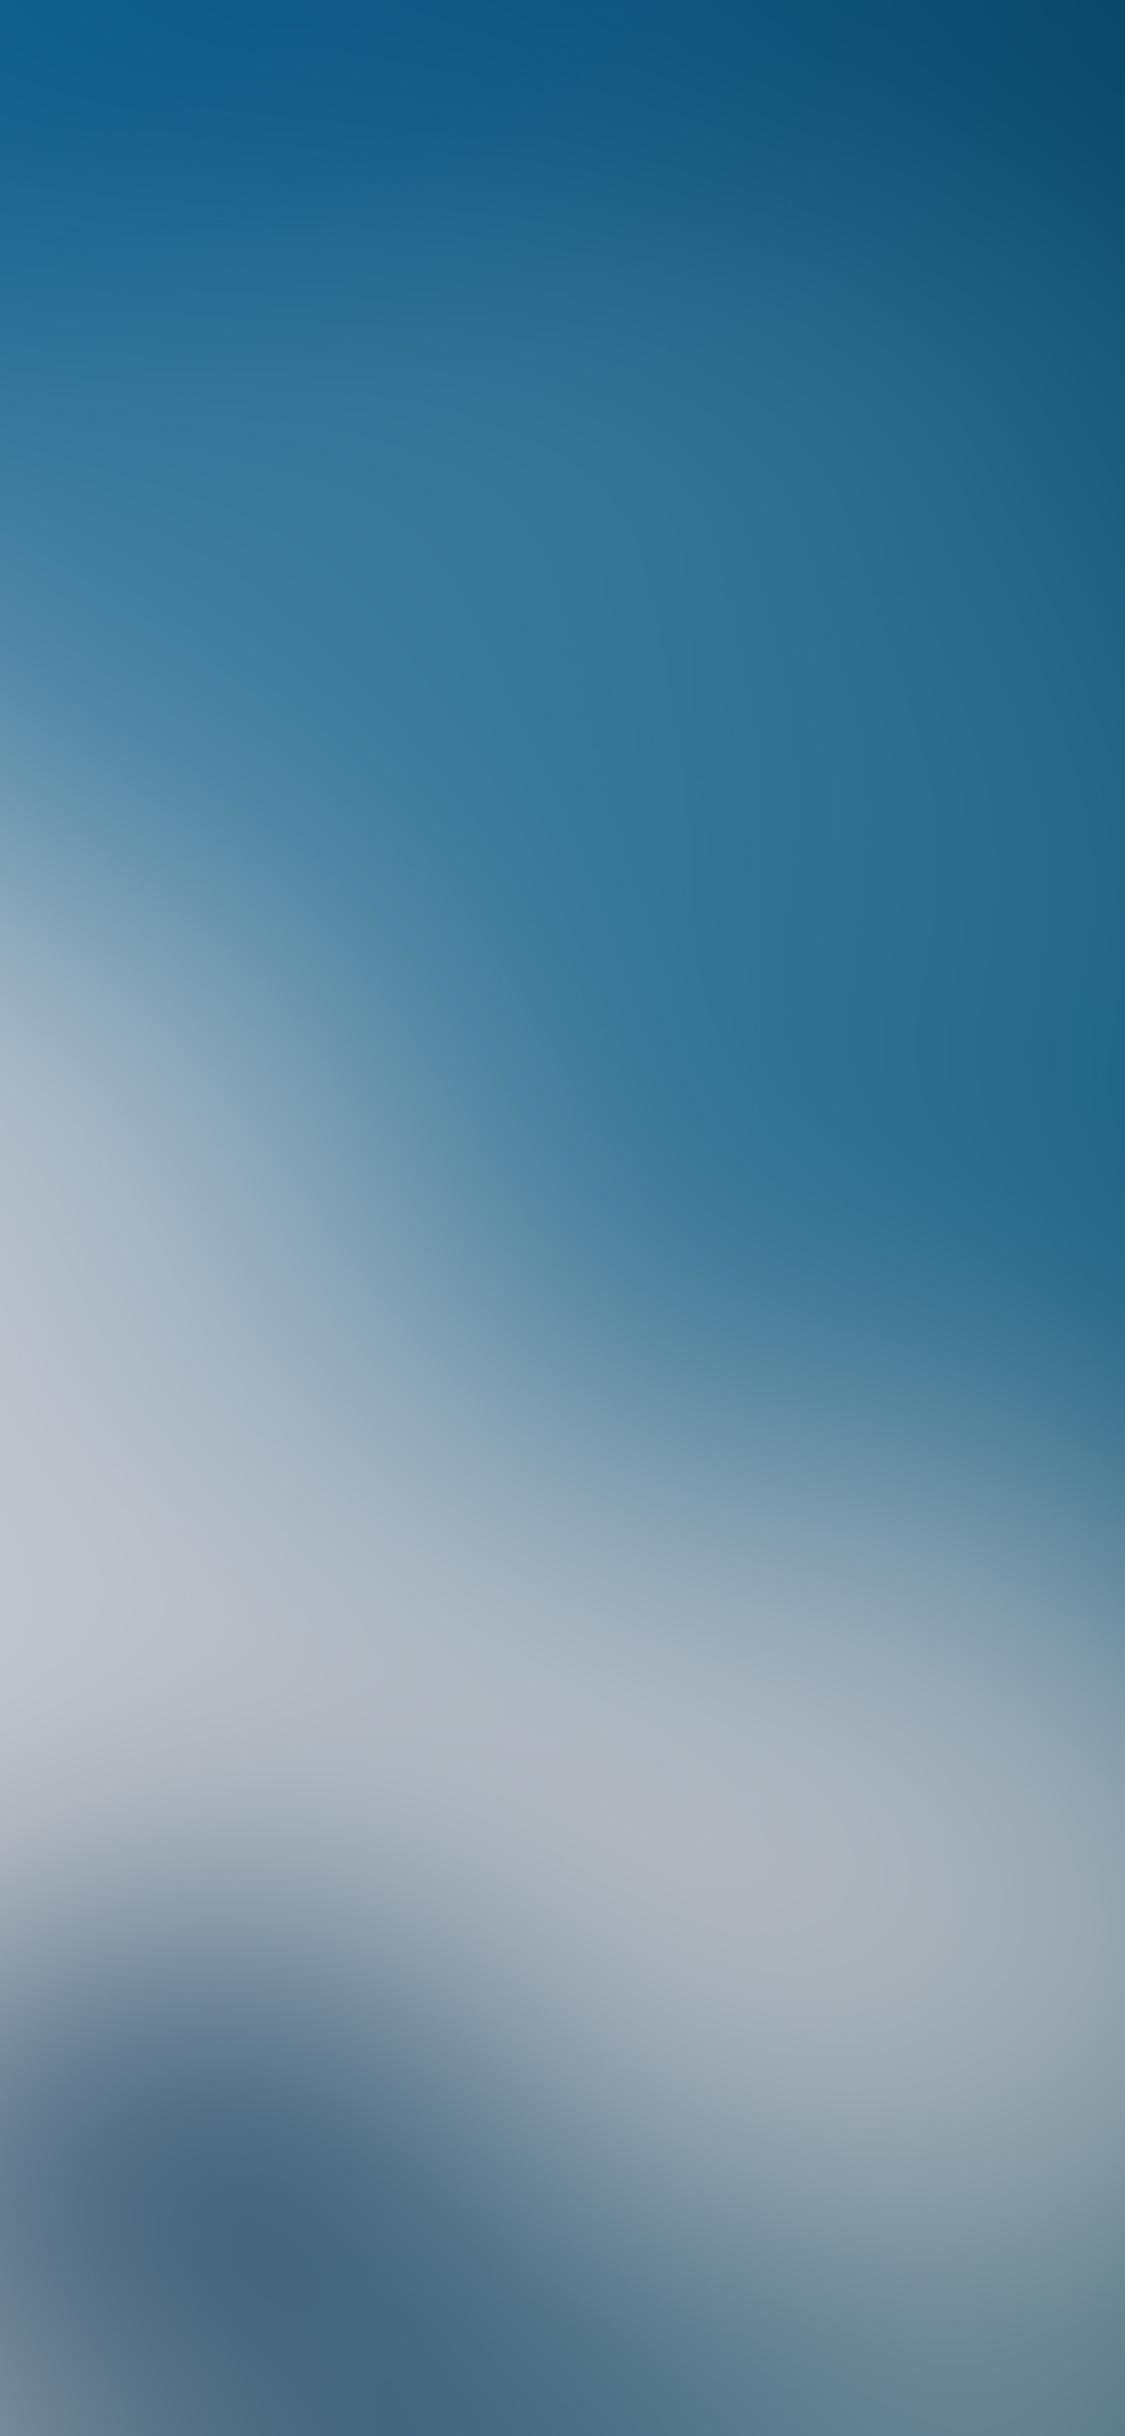 iPhoneXpapers.com-Apple-iPhone-wallpaper-sa96-wallpaper-cloud-above-7-sky-blur